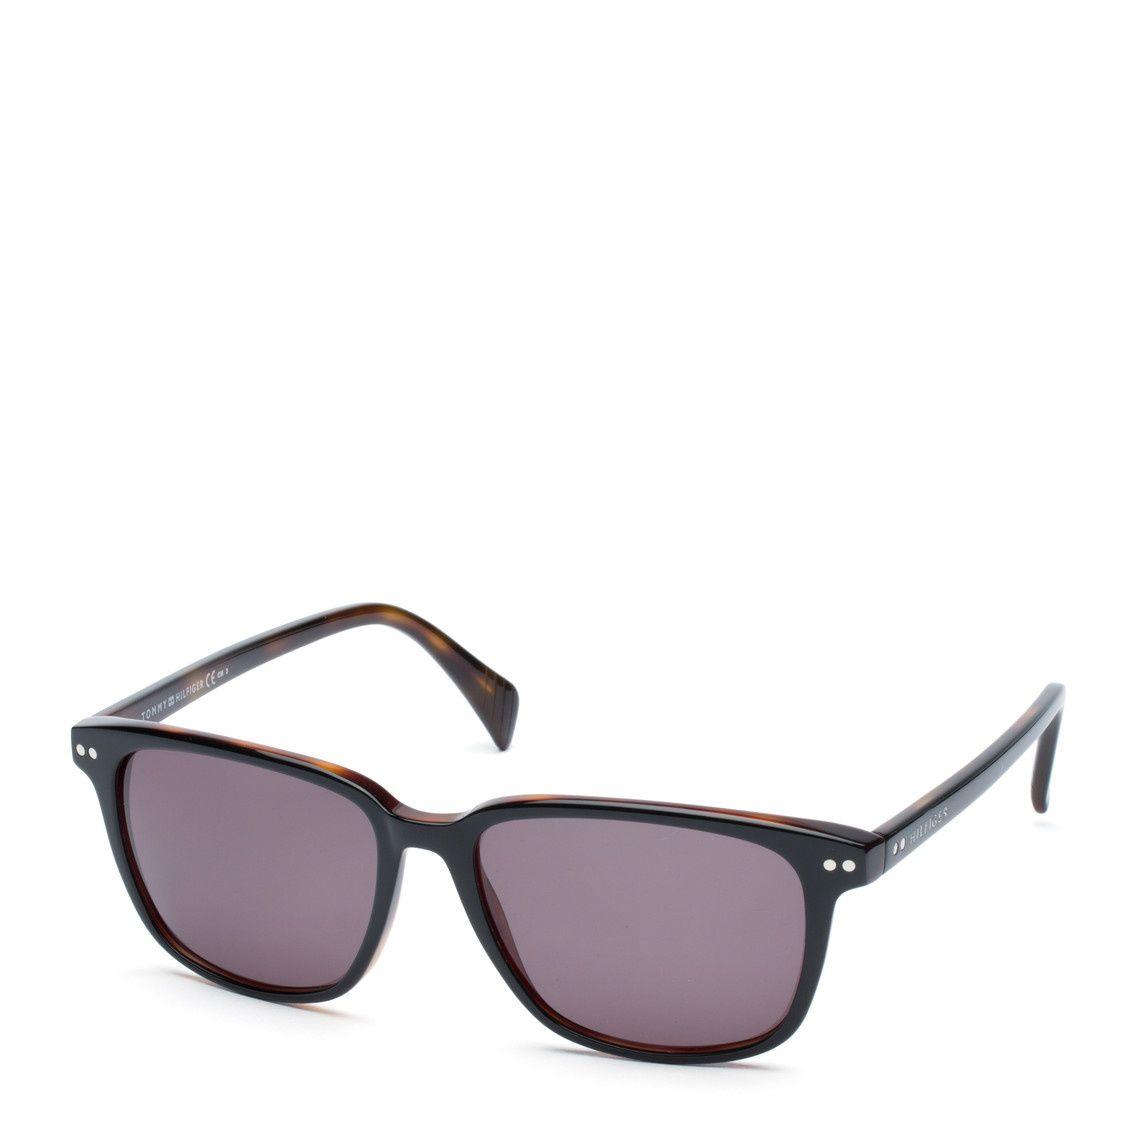 Clásicas gafas de sol en estilo carey. Montura rectangular de ...